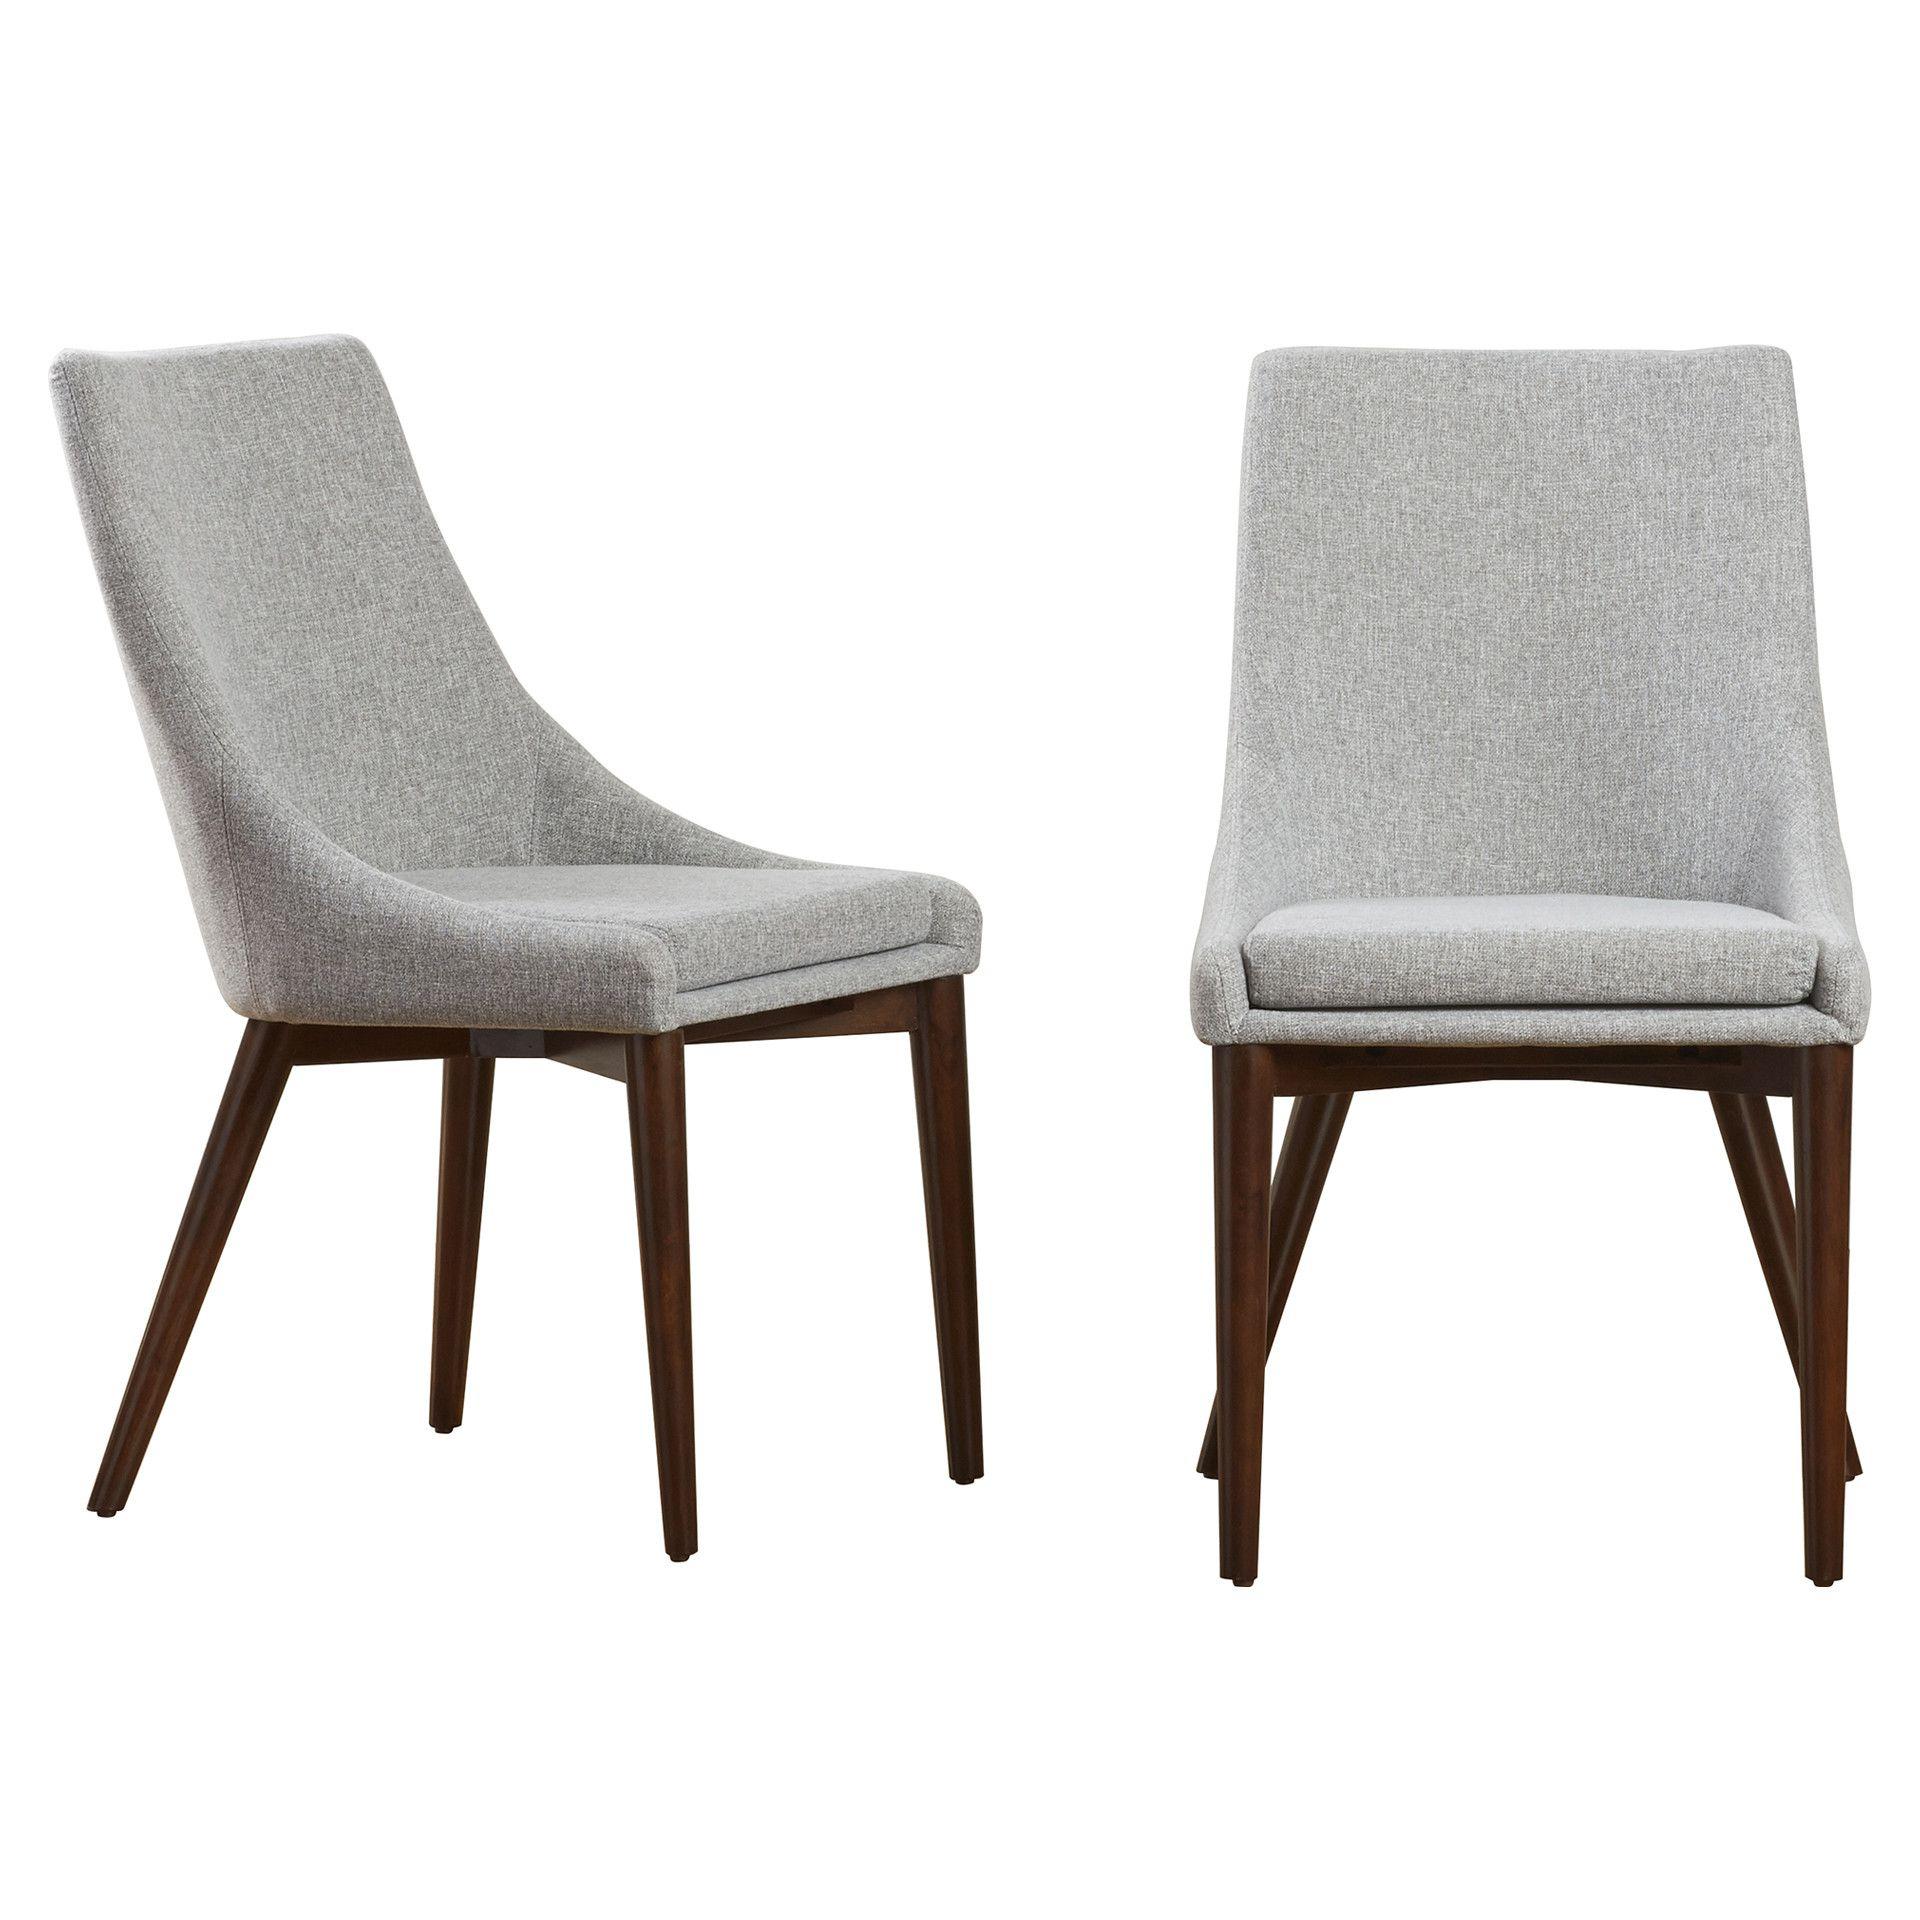 Corrigan Studio Carmelo Parsons Chair (View 3 of 20)